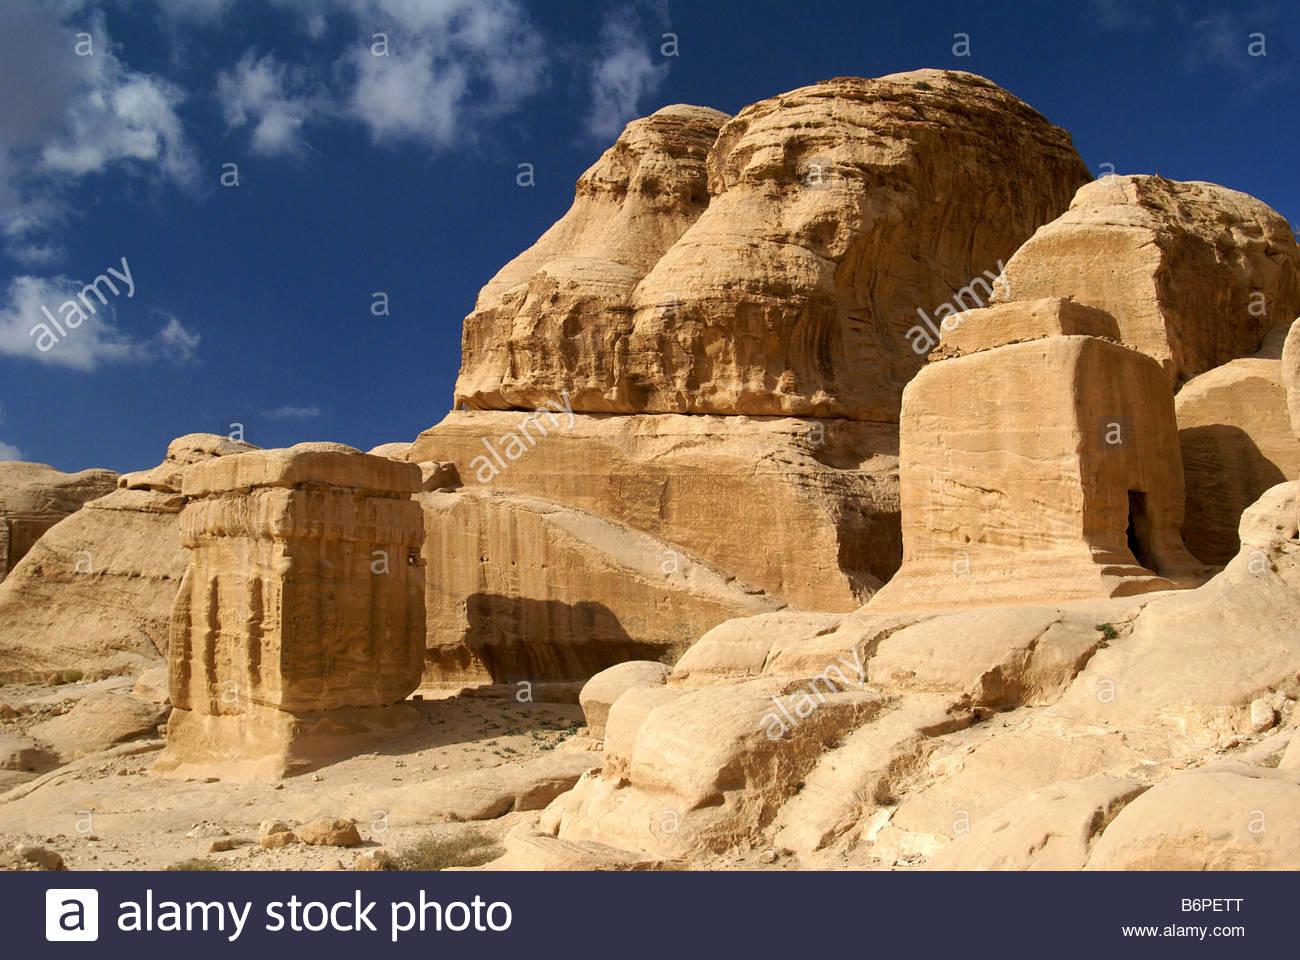 Blocchi di Djinn - antiche tombe di Petra in Giordania Immagini Stock